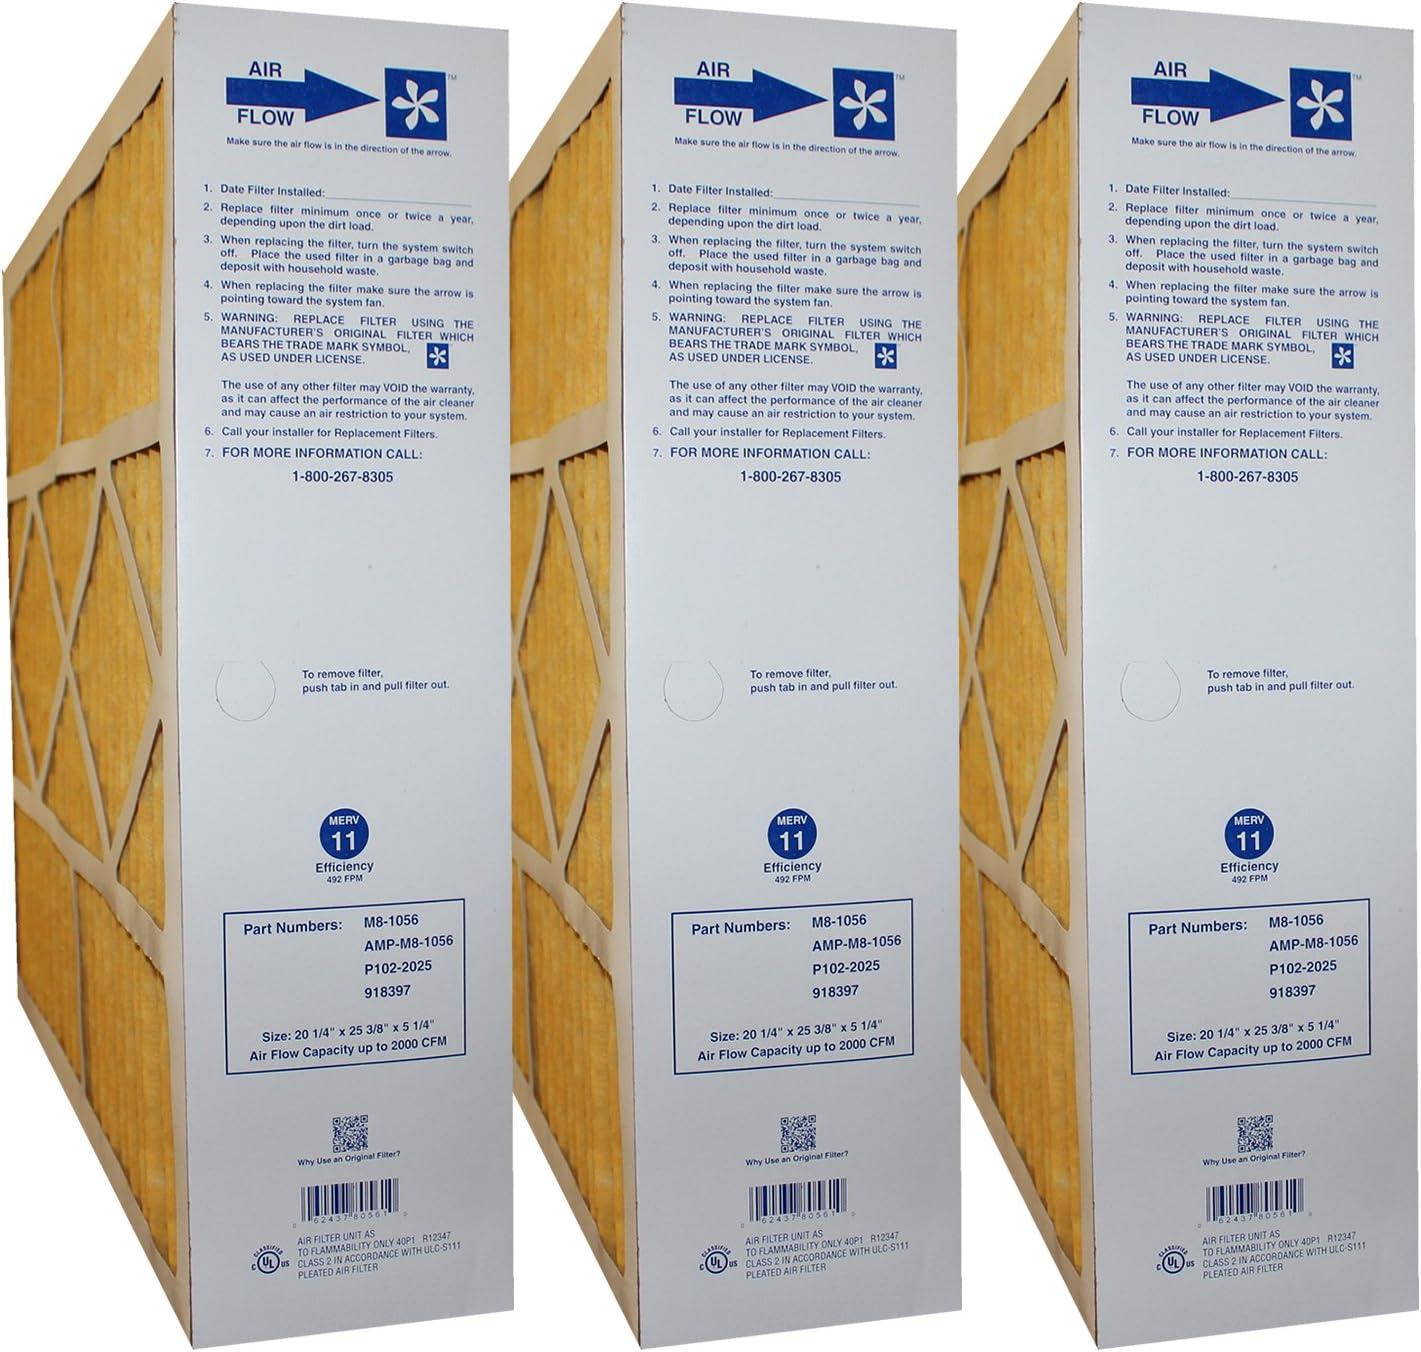 Case of 2 Filters Genuine Original Part # M2-1056 MERV 11 Size 20x20x5 Actual Size: 20-1//4 x 20-3//4 x 5-1//4